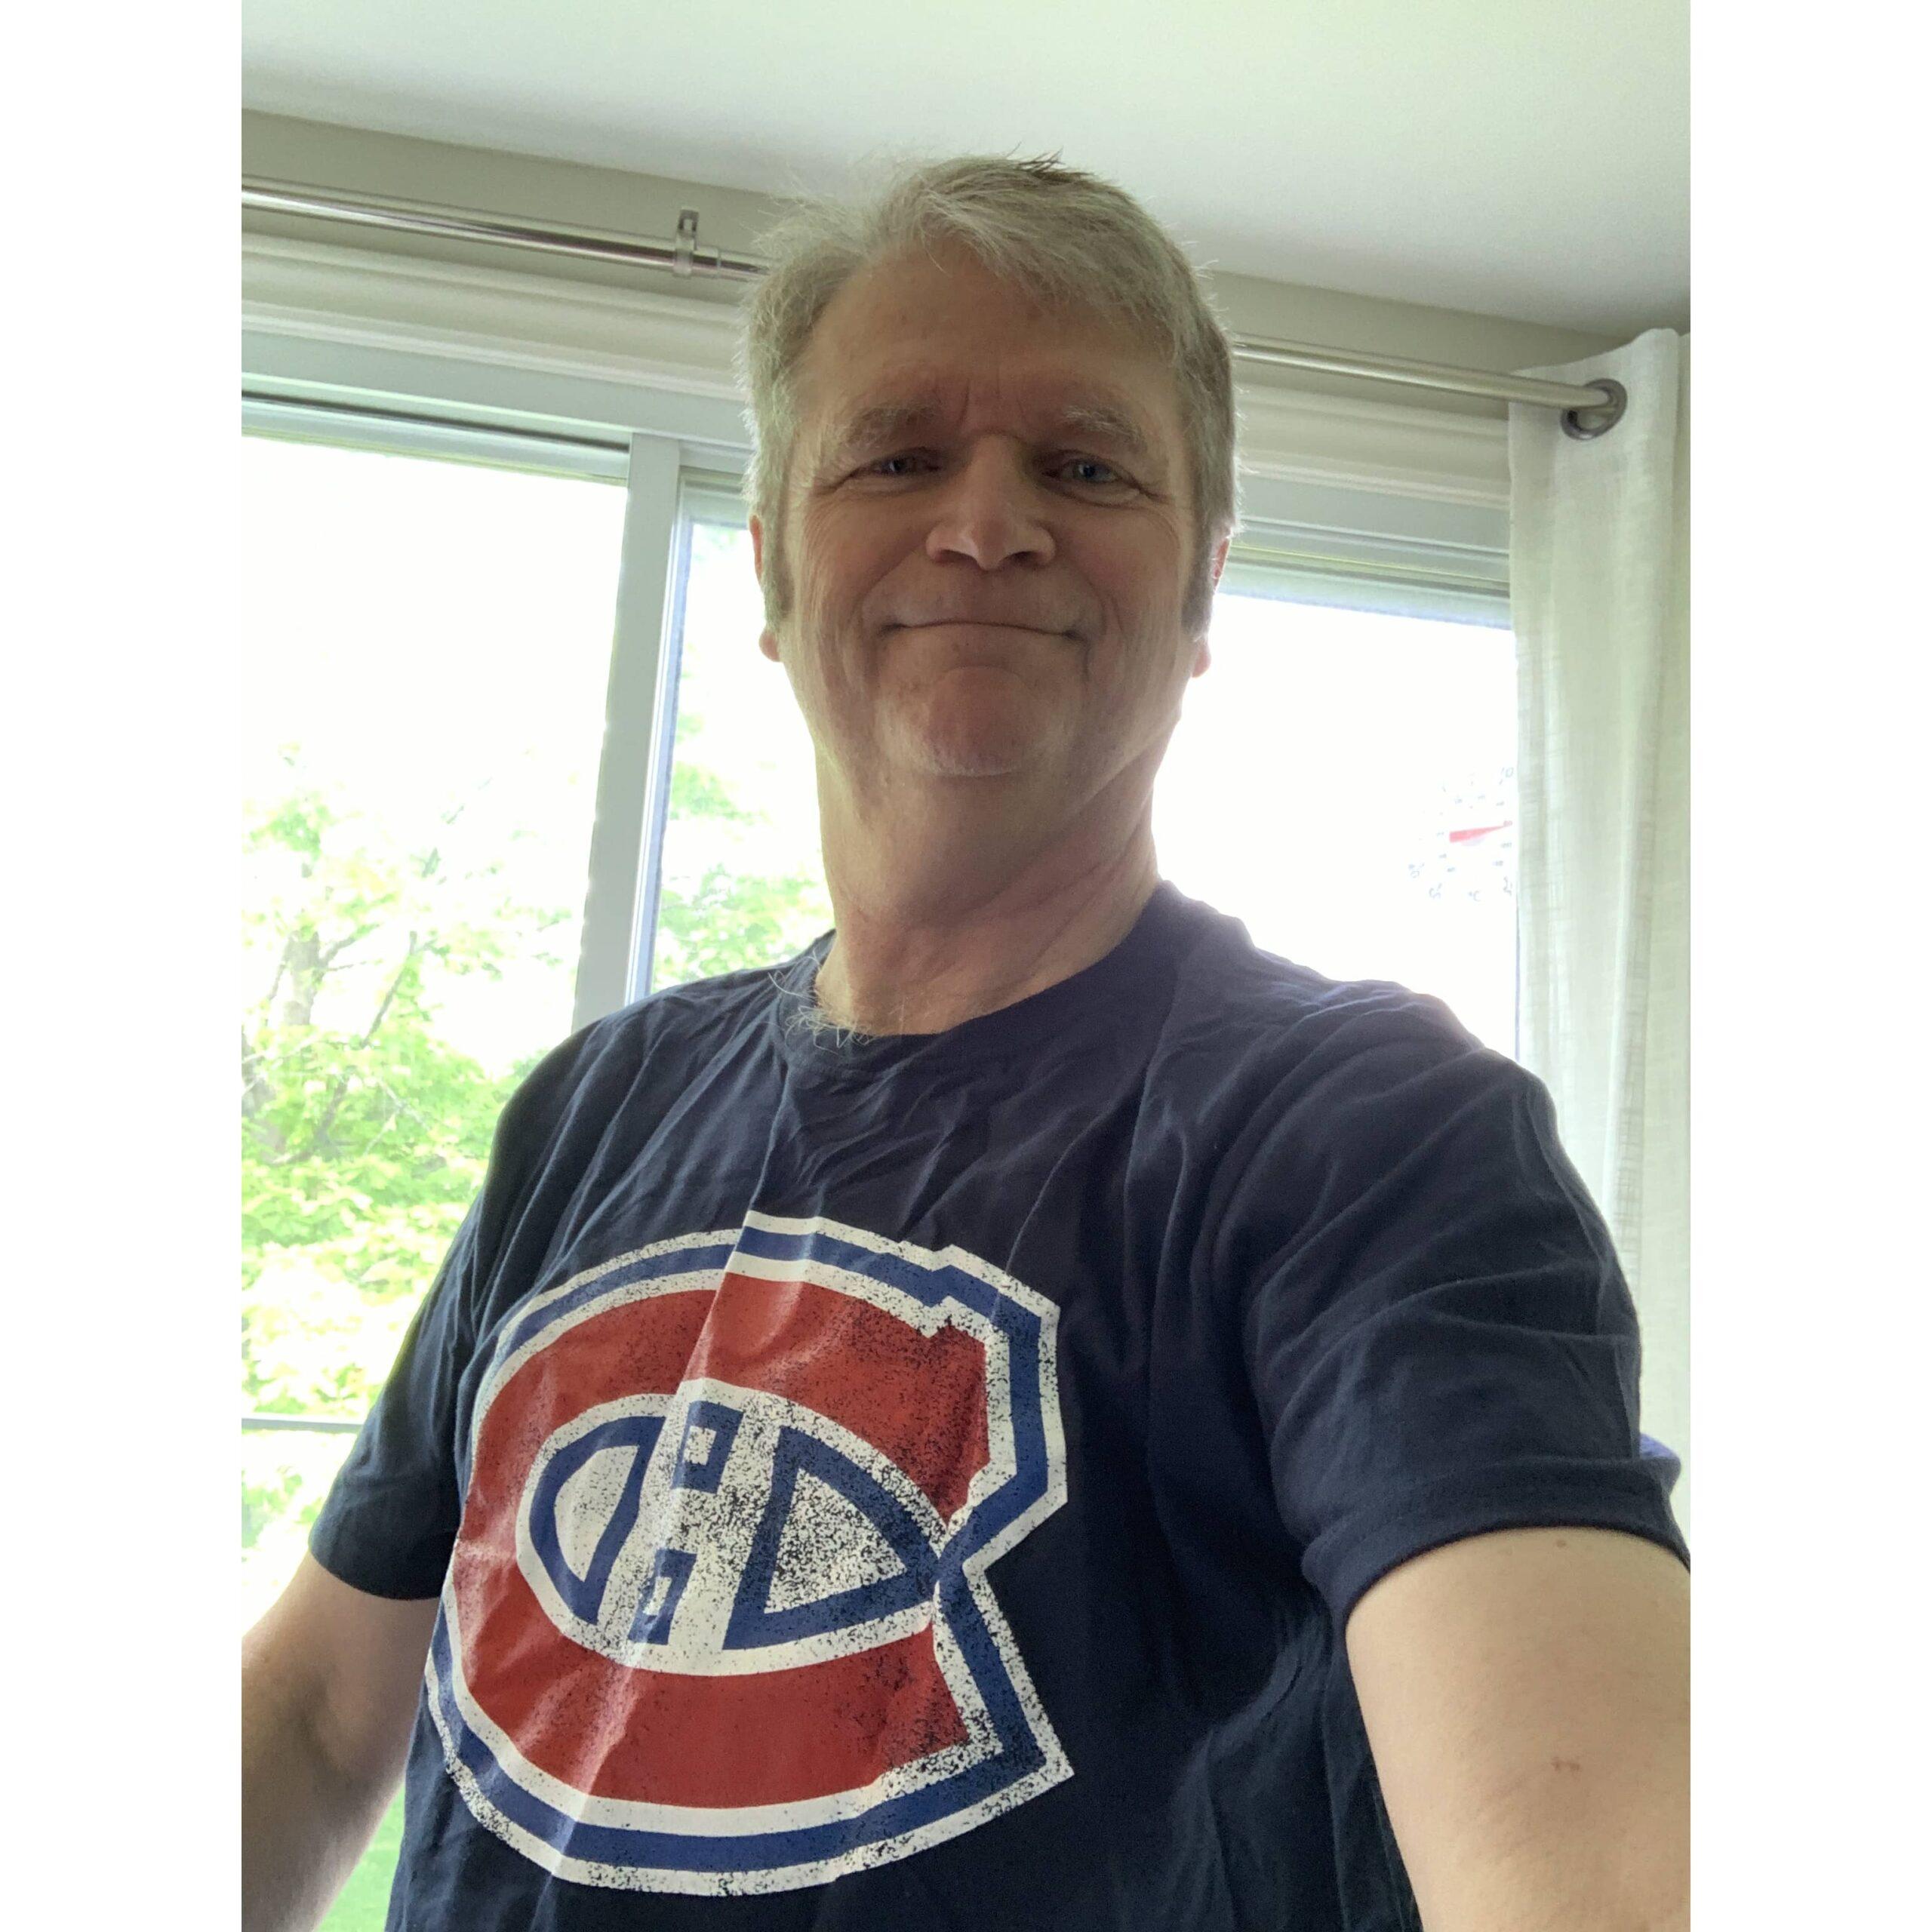 Paul in Habs t-shirt